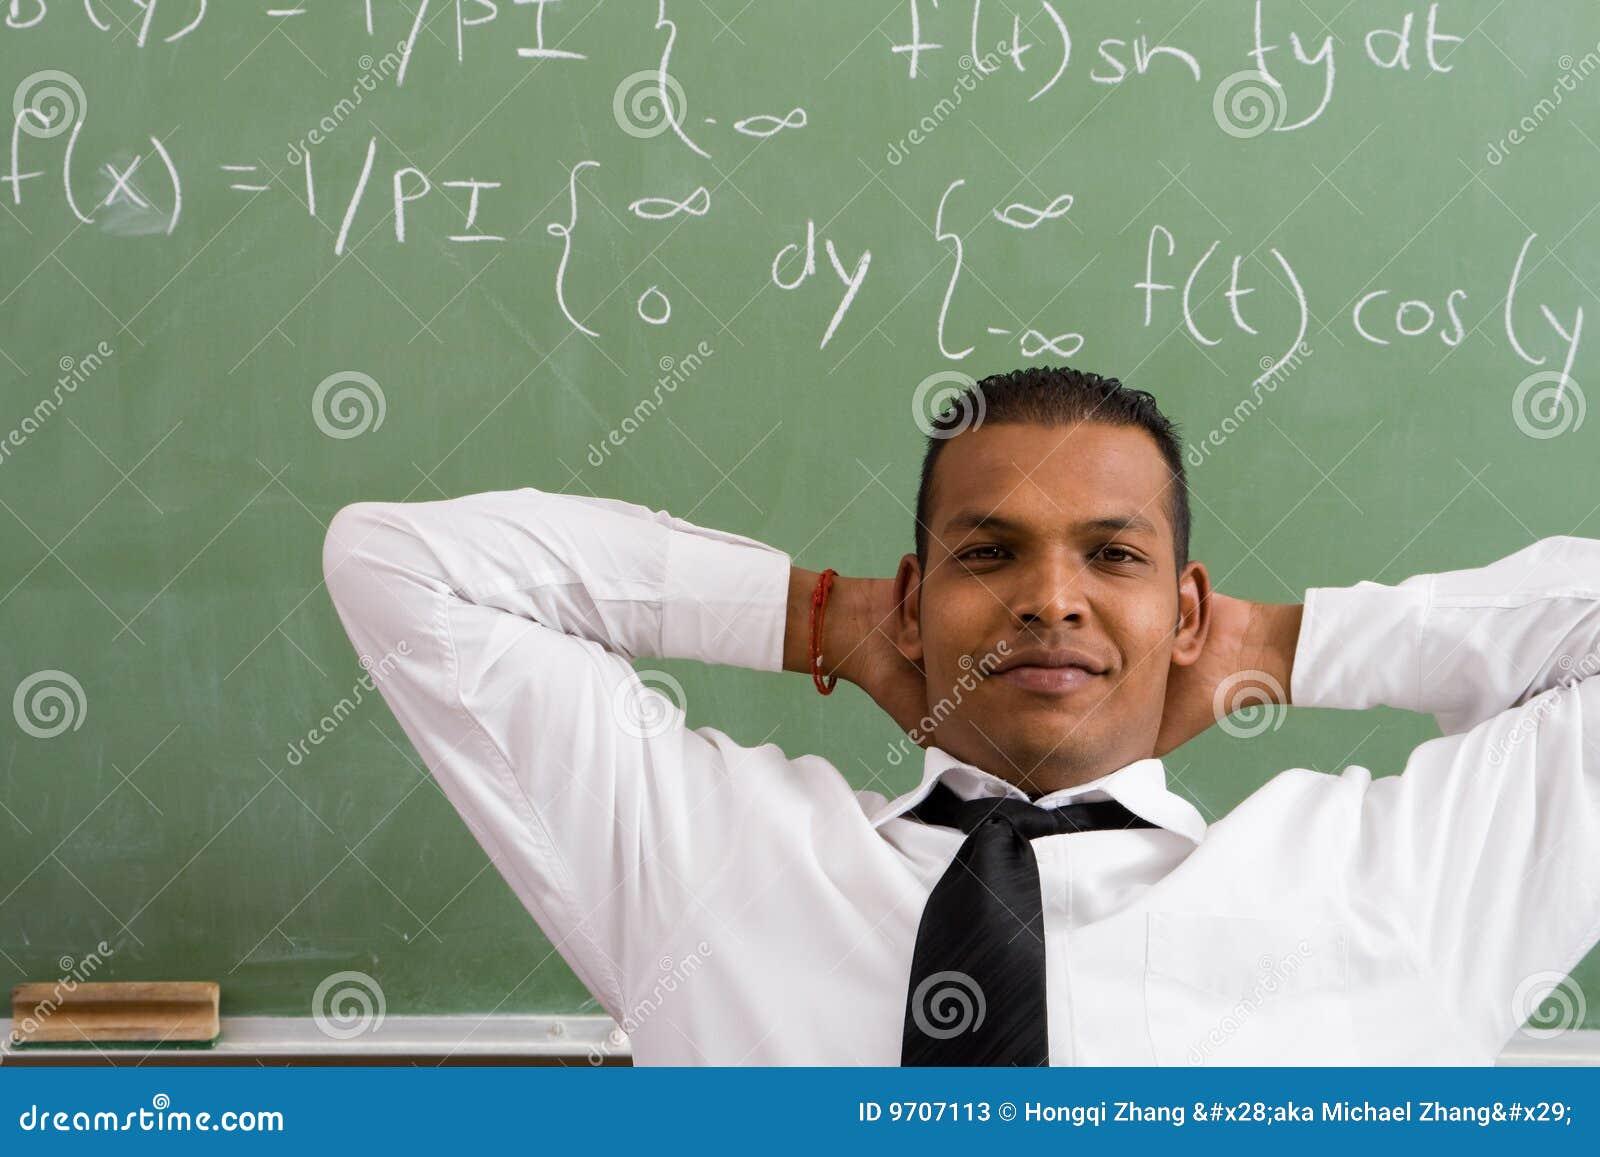 Math teacher stock image. Image of looking, adult, portrait - 9707113